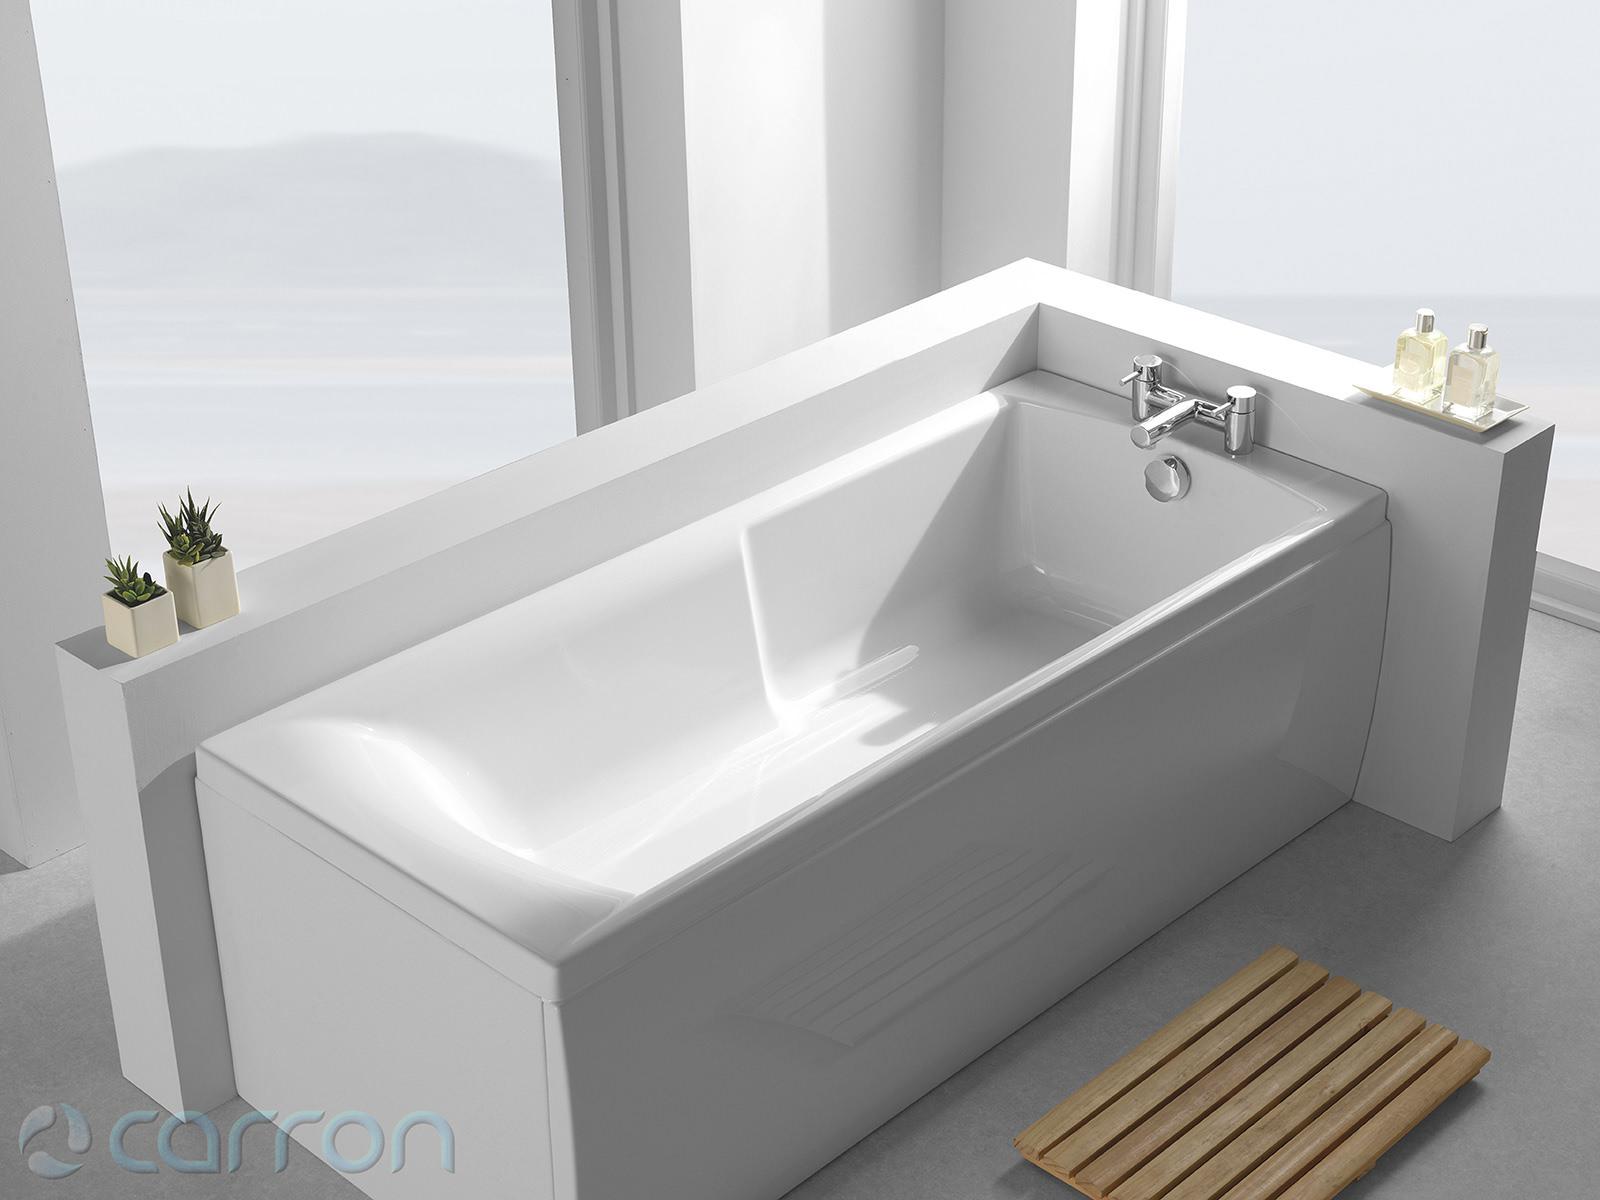 Carron Matrix Acrylic Bath 1700 X 700mm Cabma175pa Q4